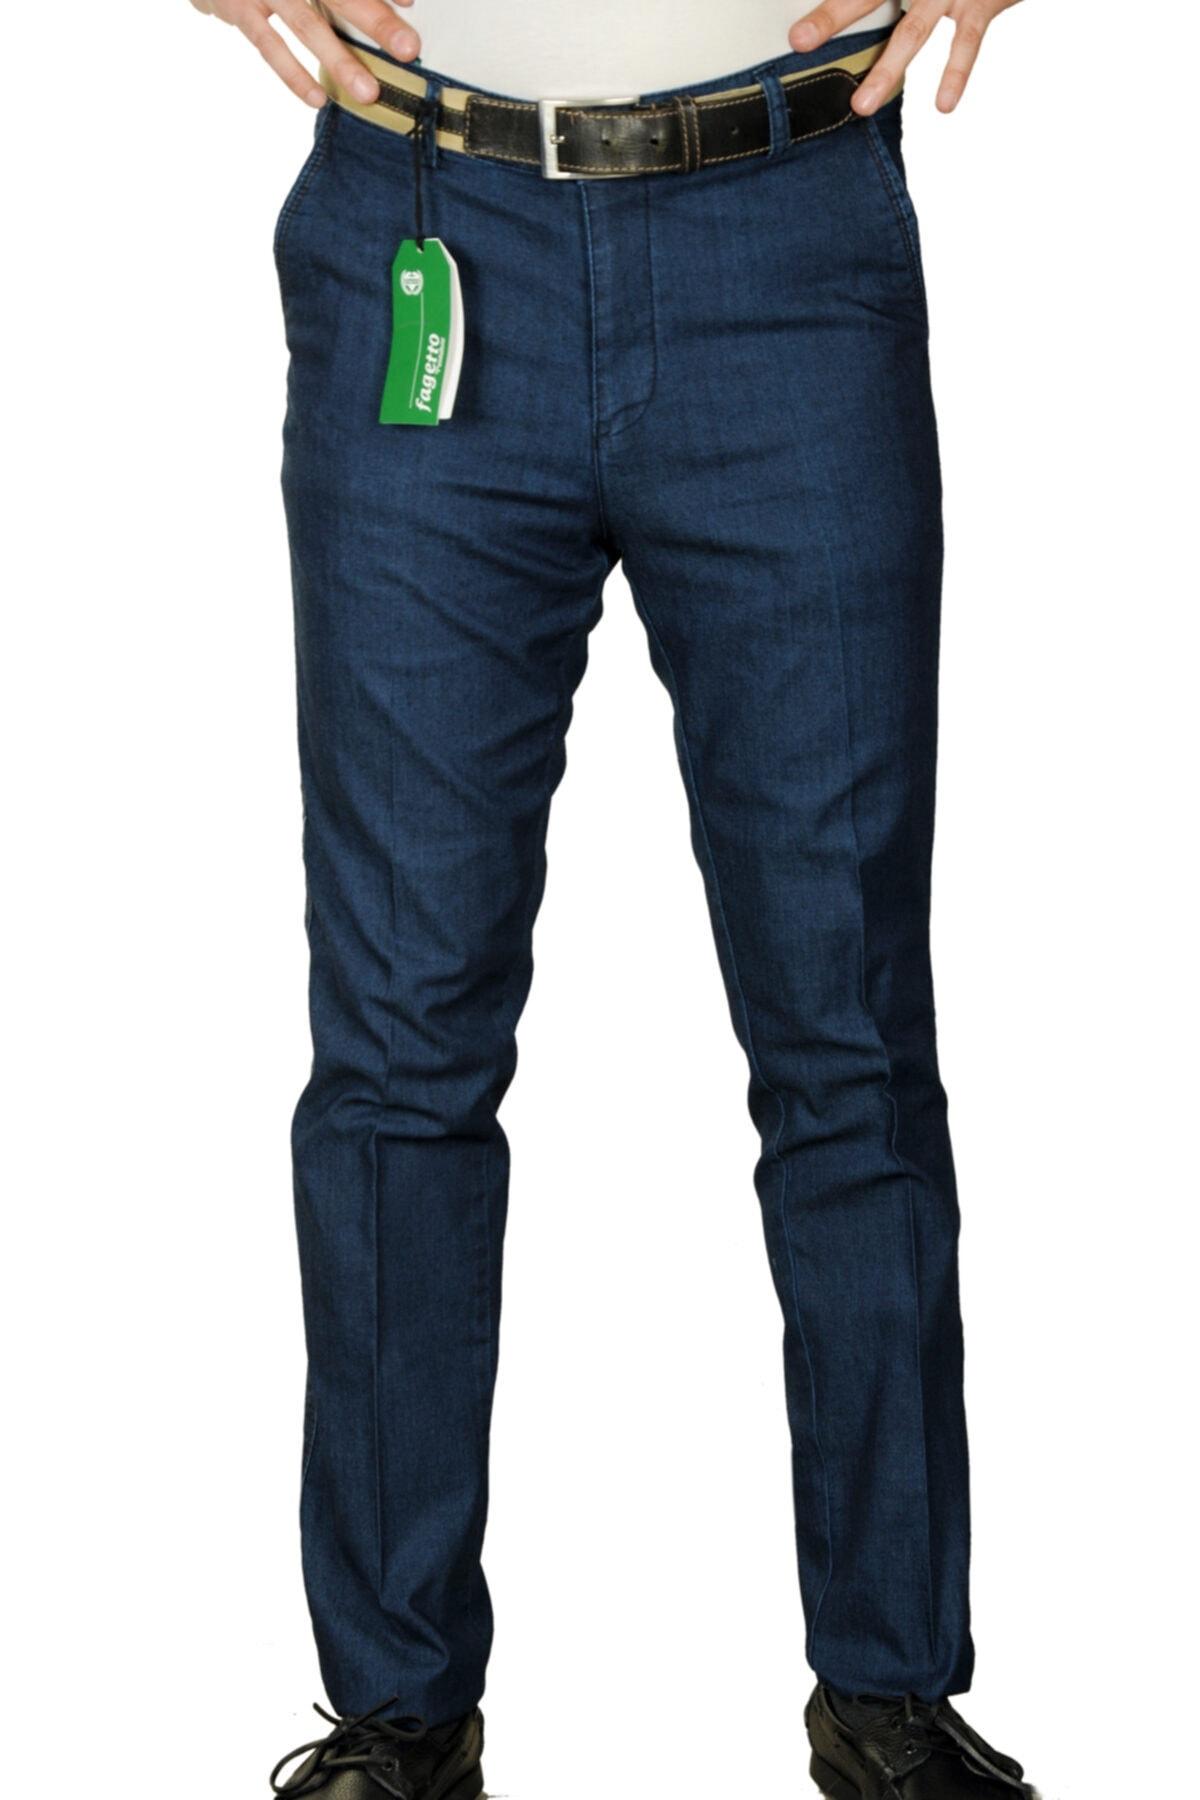 Tensel Kot Esnek Likralı Pamuklu Classic Erkek Keten Pantolon